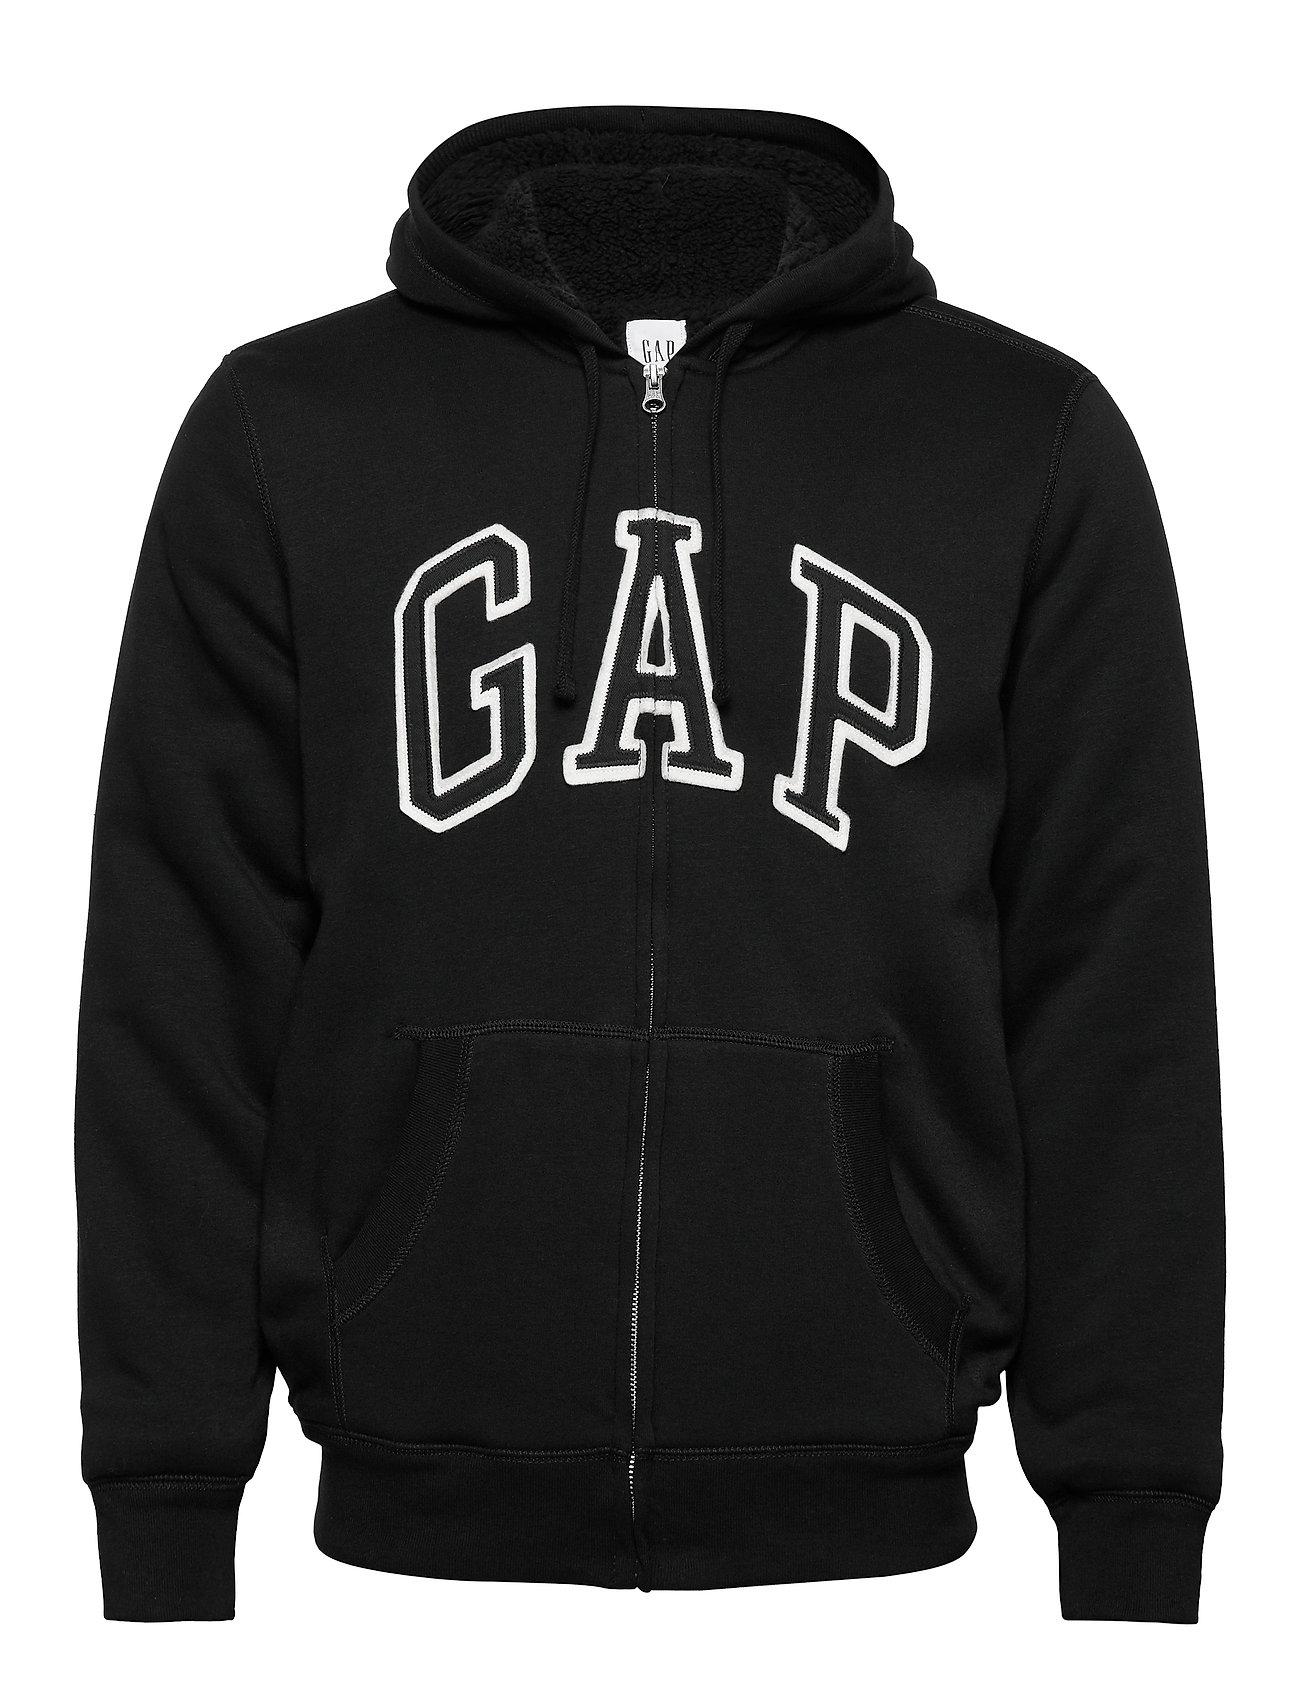 GAP V-ARCH SHERPA FZ - TRUE BLACK